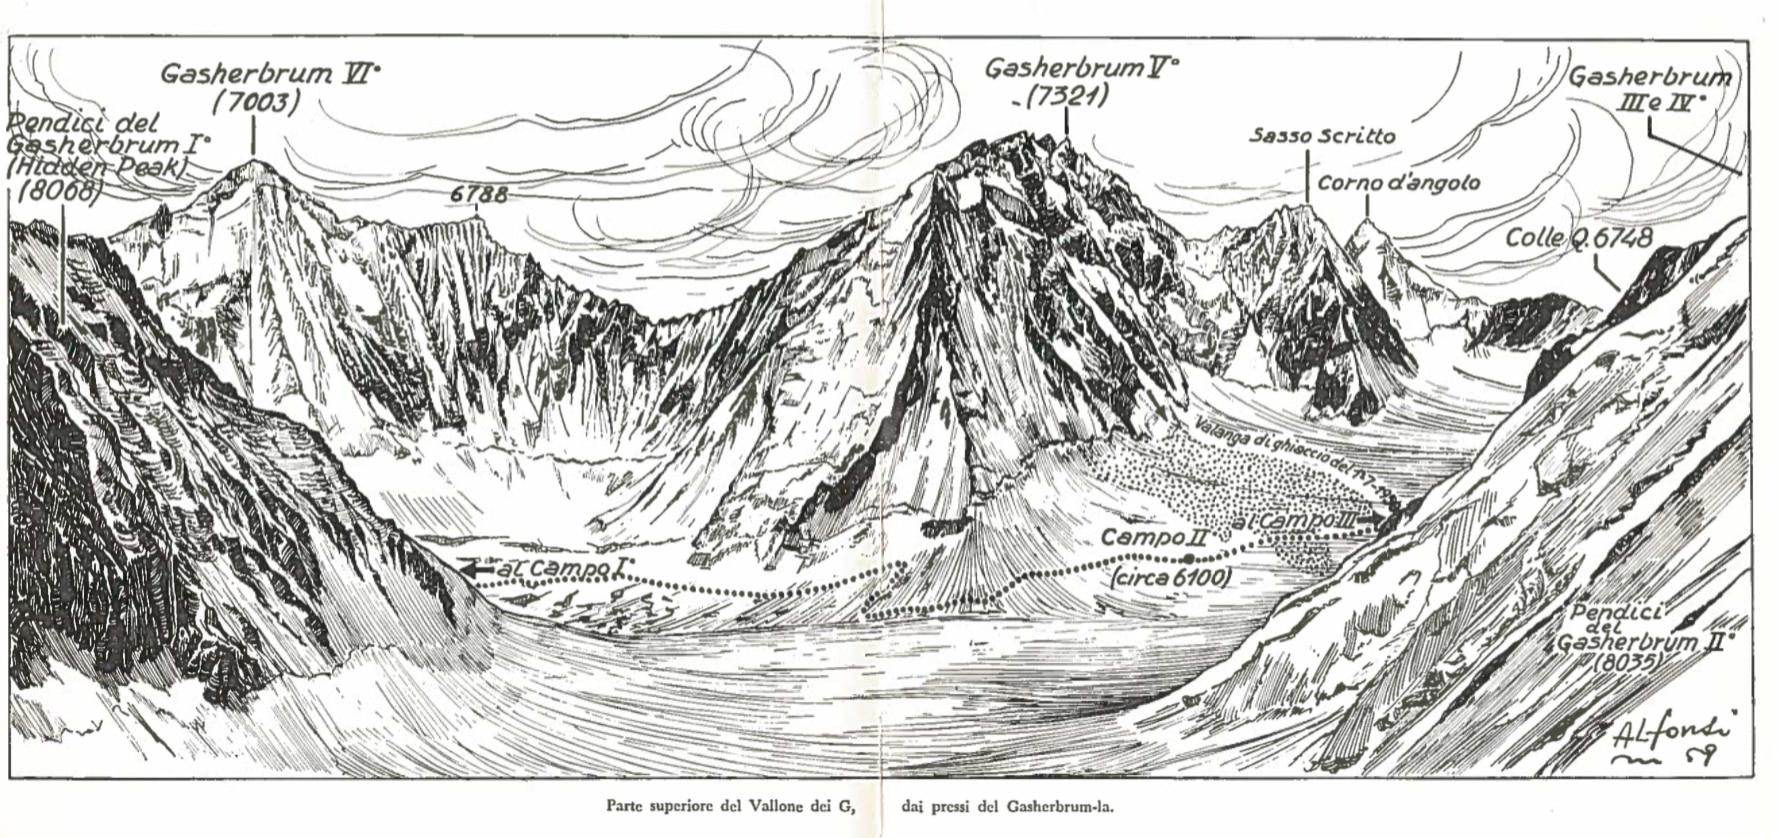 Photo of Aggiornamenti dal Gasherbrum IV